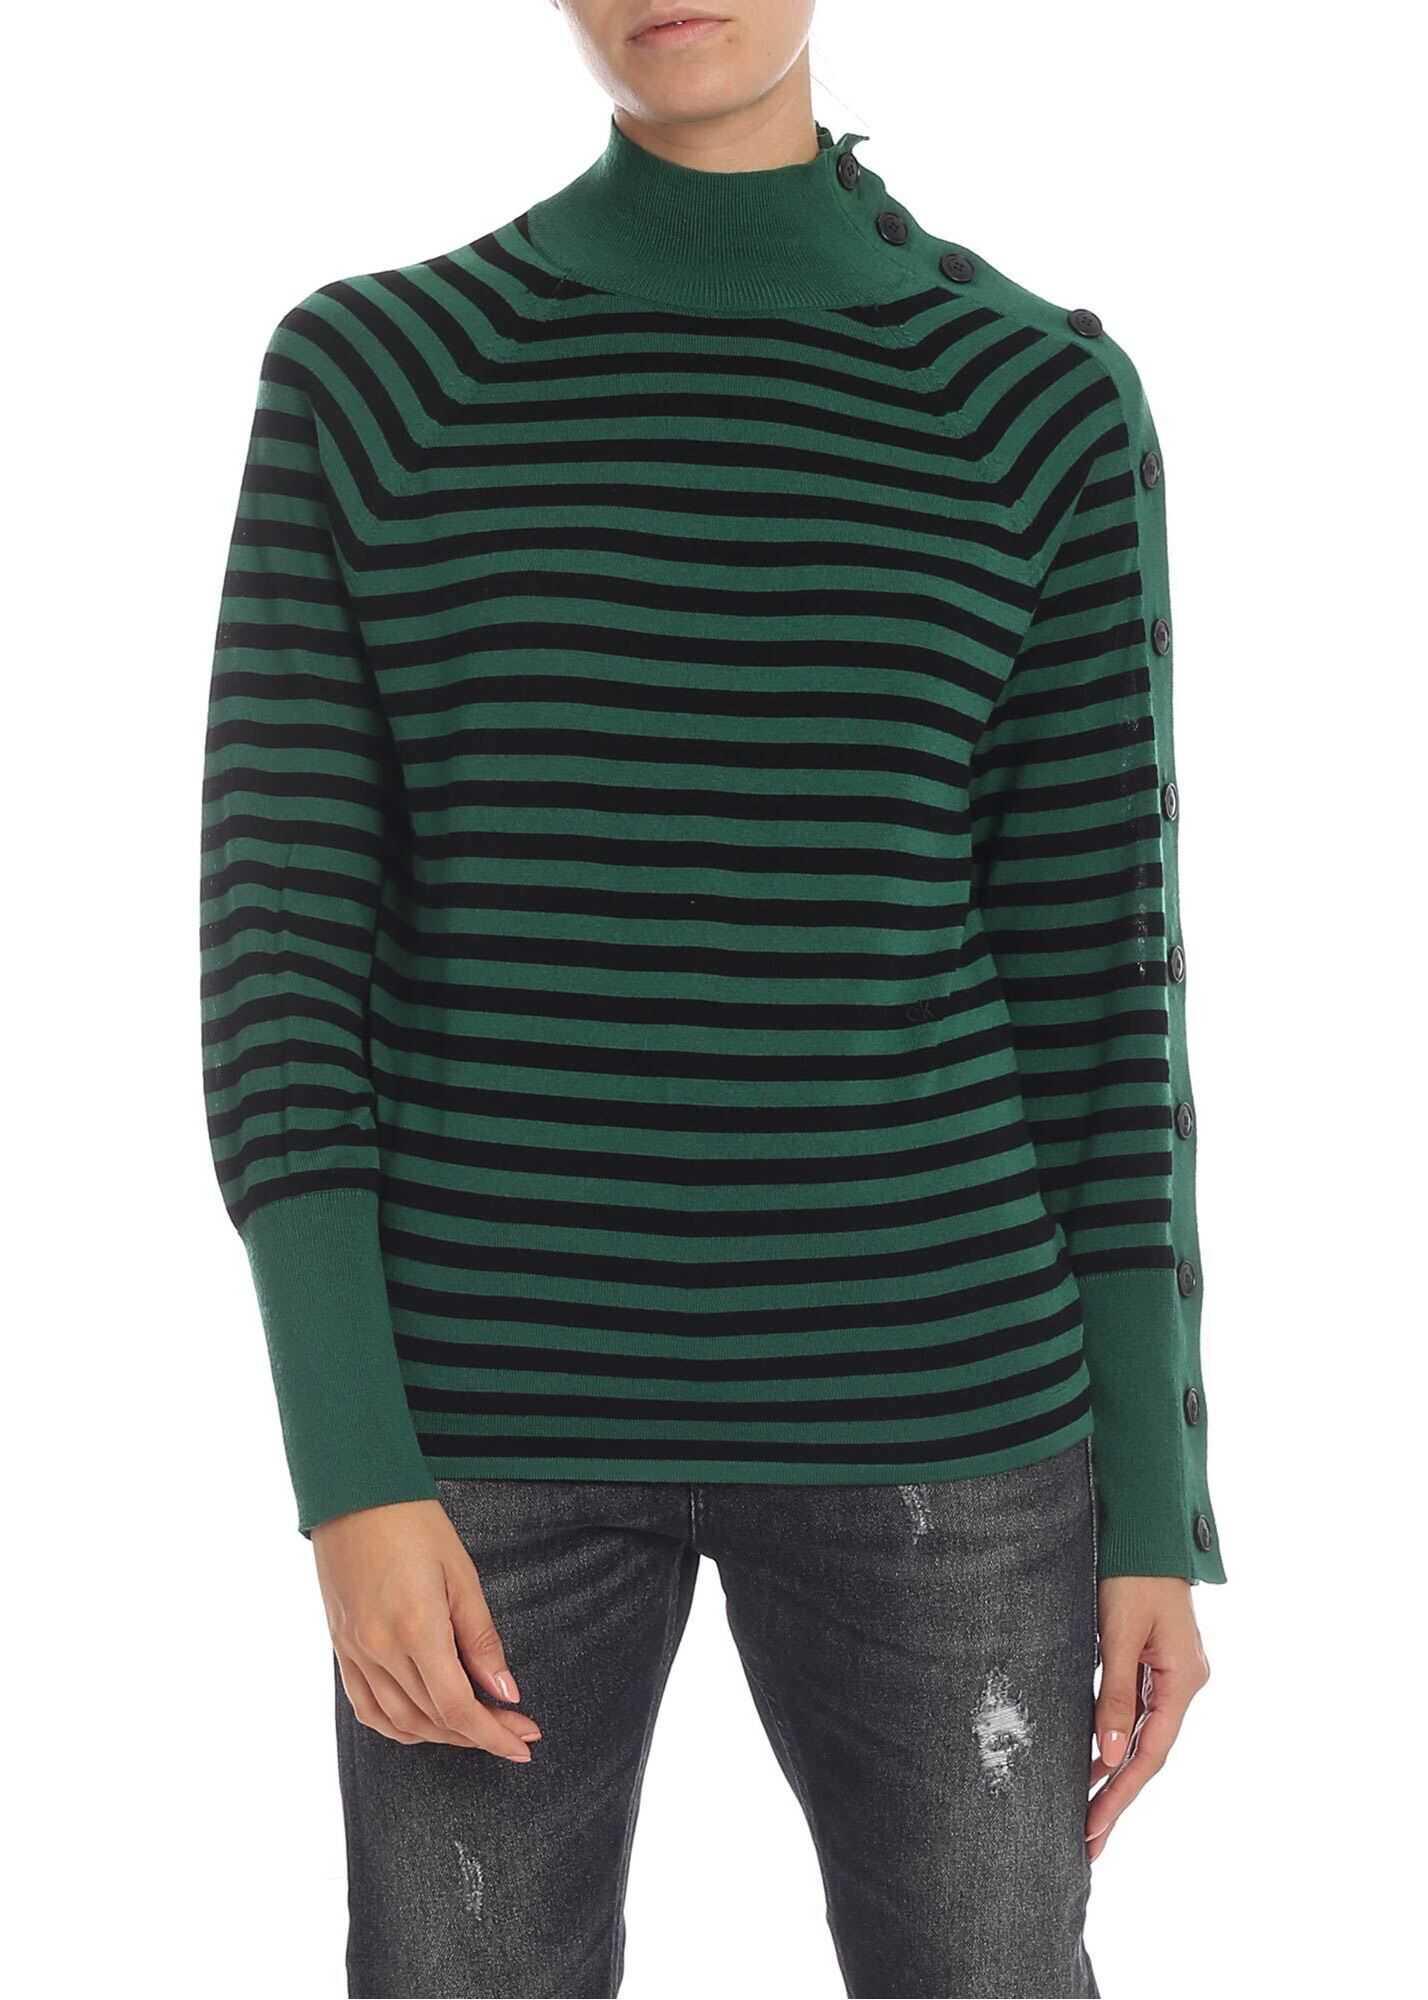 Calvin Klein Green Striped Shirt With Buttons Green